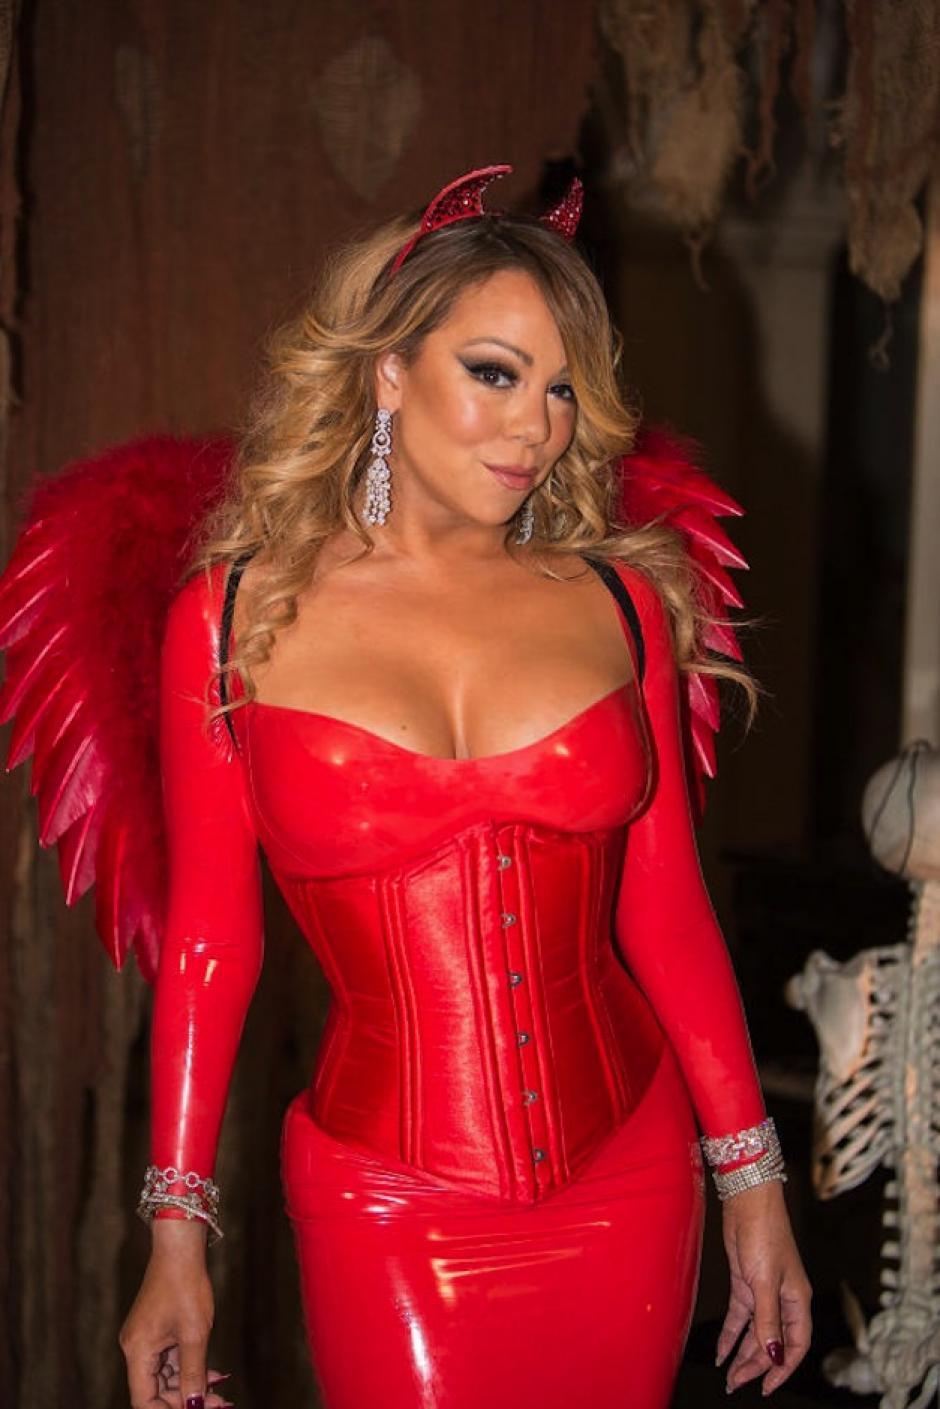 Mariah decidió interpretar a una sexy diablita. (Foto: Quién)